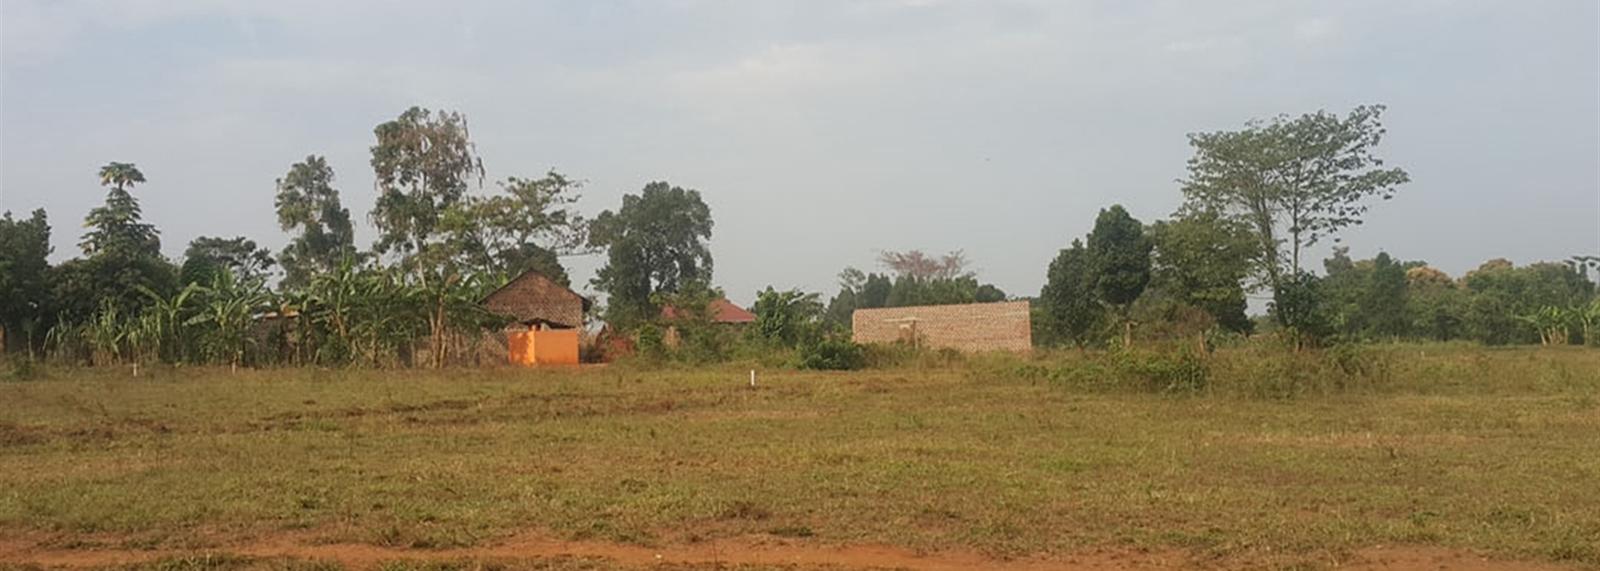 Kiyunga